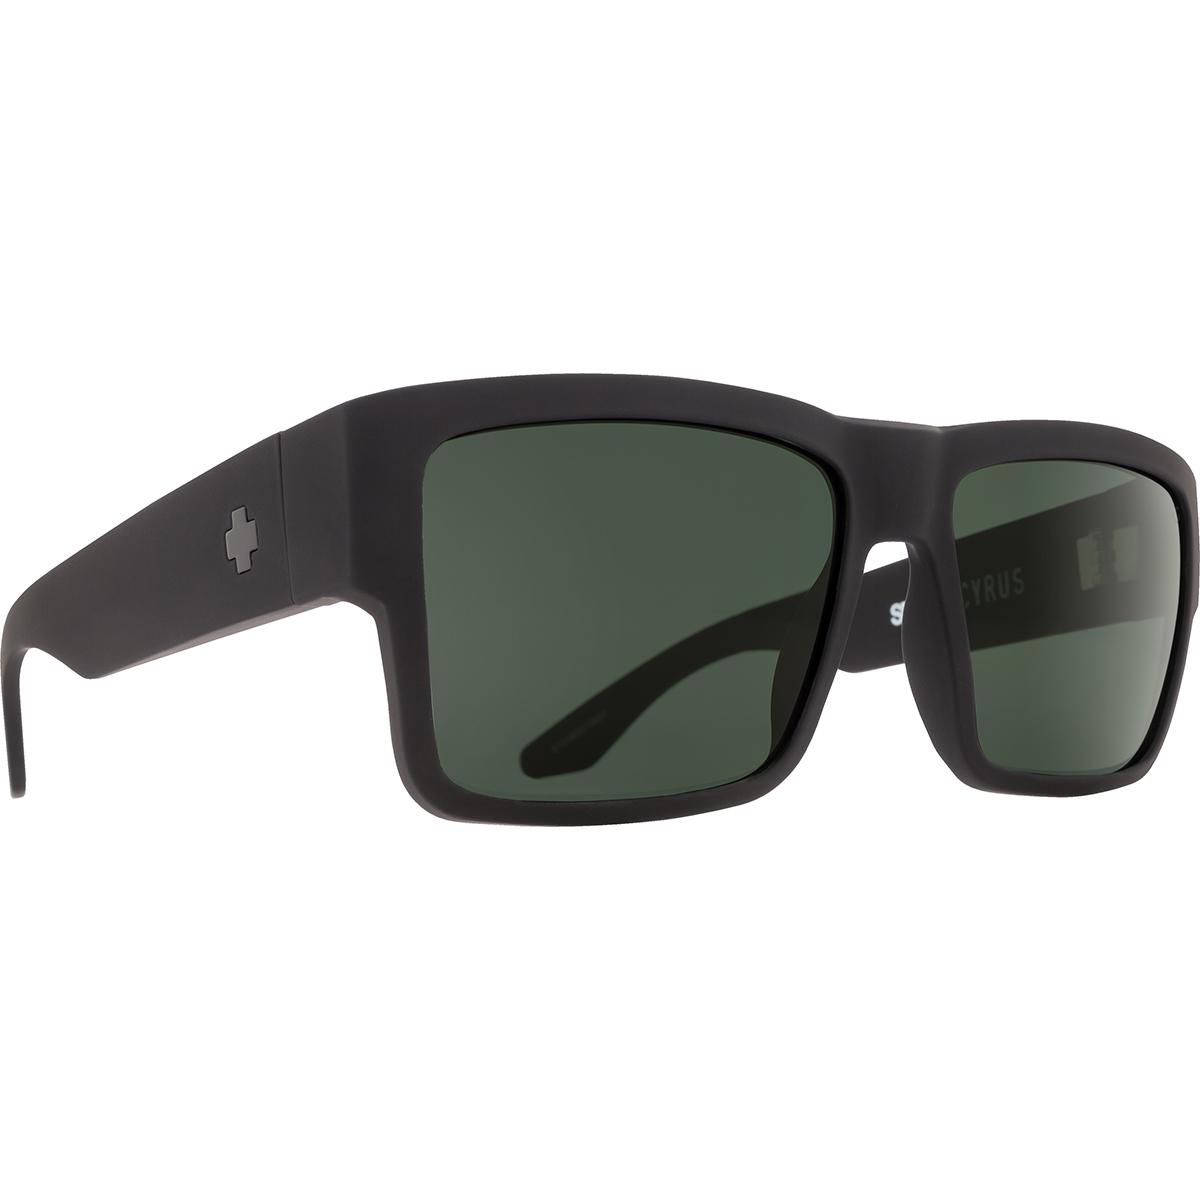 SPY SUNGLASSES スパイ サングラス CYRUS サイラス SOFT MATTE BLACK - HAPPY GRAY GREEN POLAR 673180973864